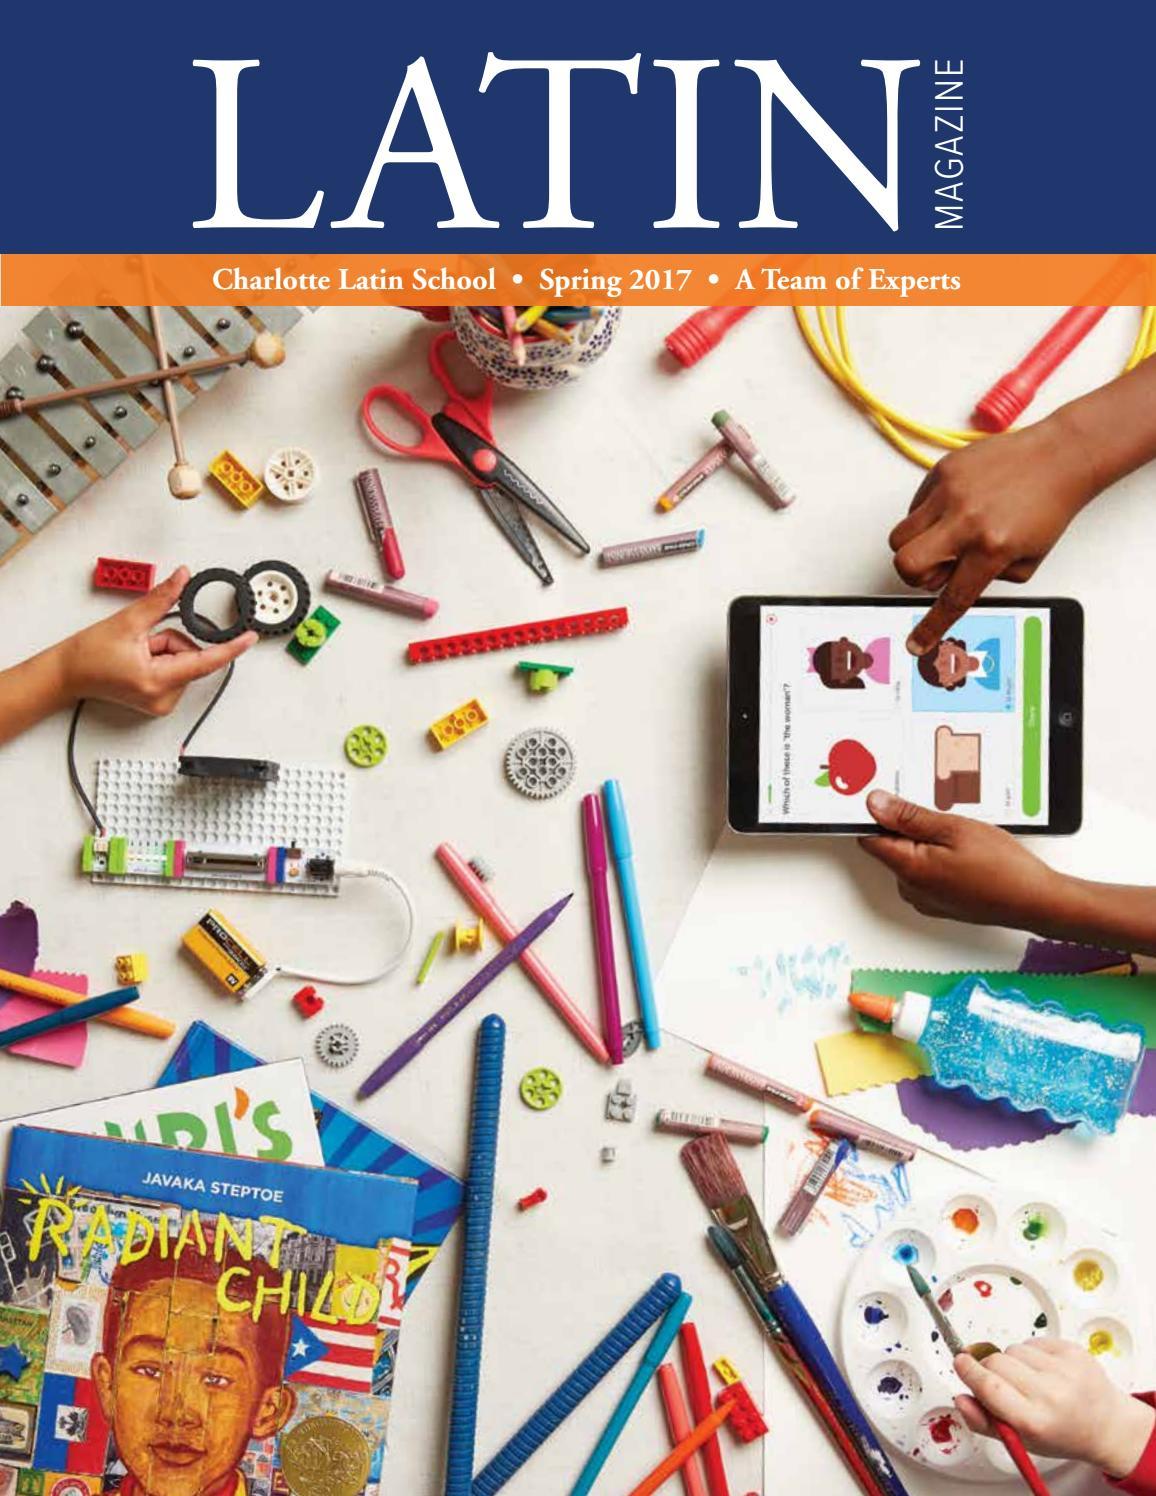 Latin Magazine Spring 2017 by Charlotte Latin School - issuu